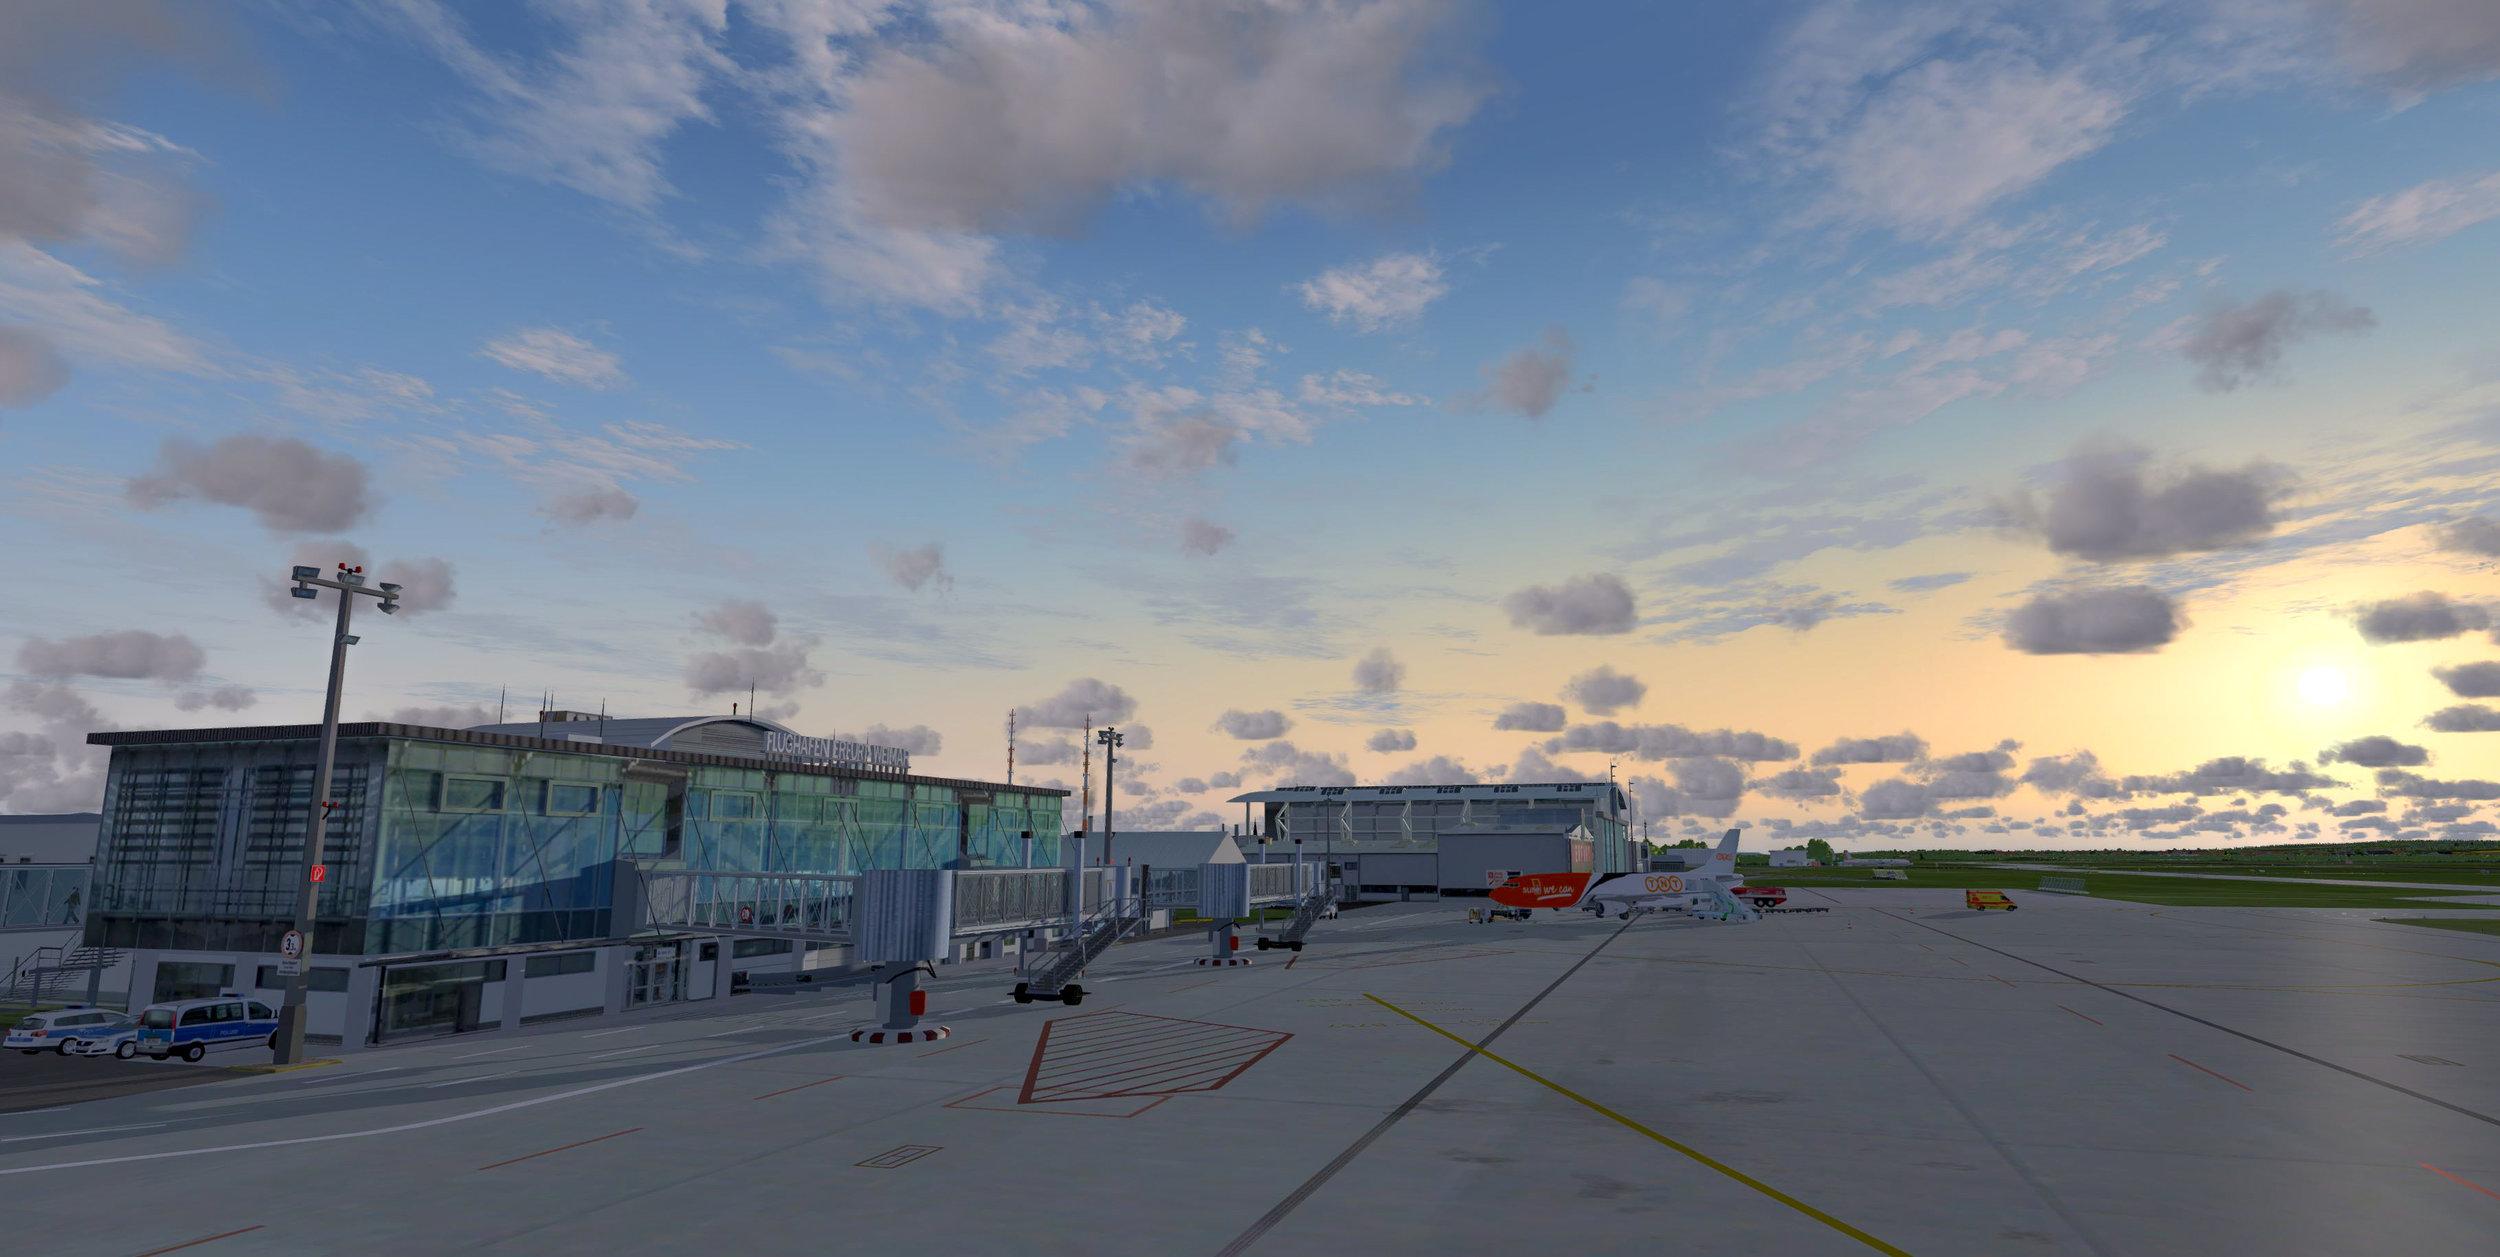 Airport_Erfurt_P3Dv4_04.jpg